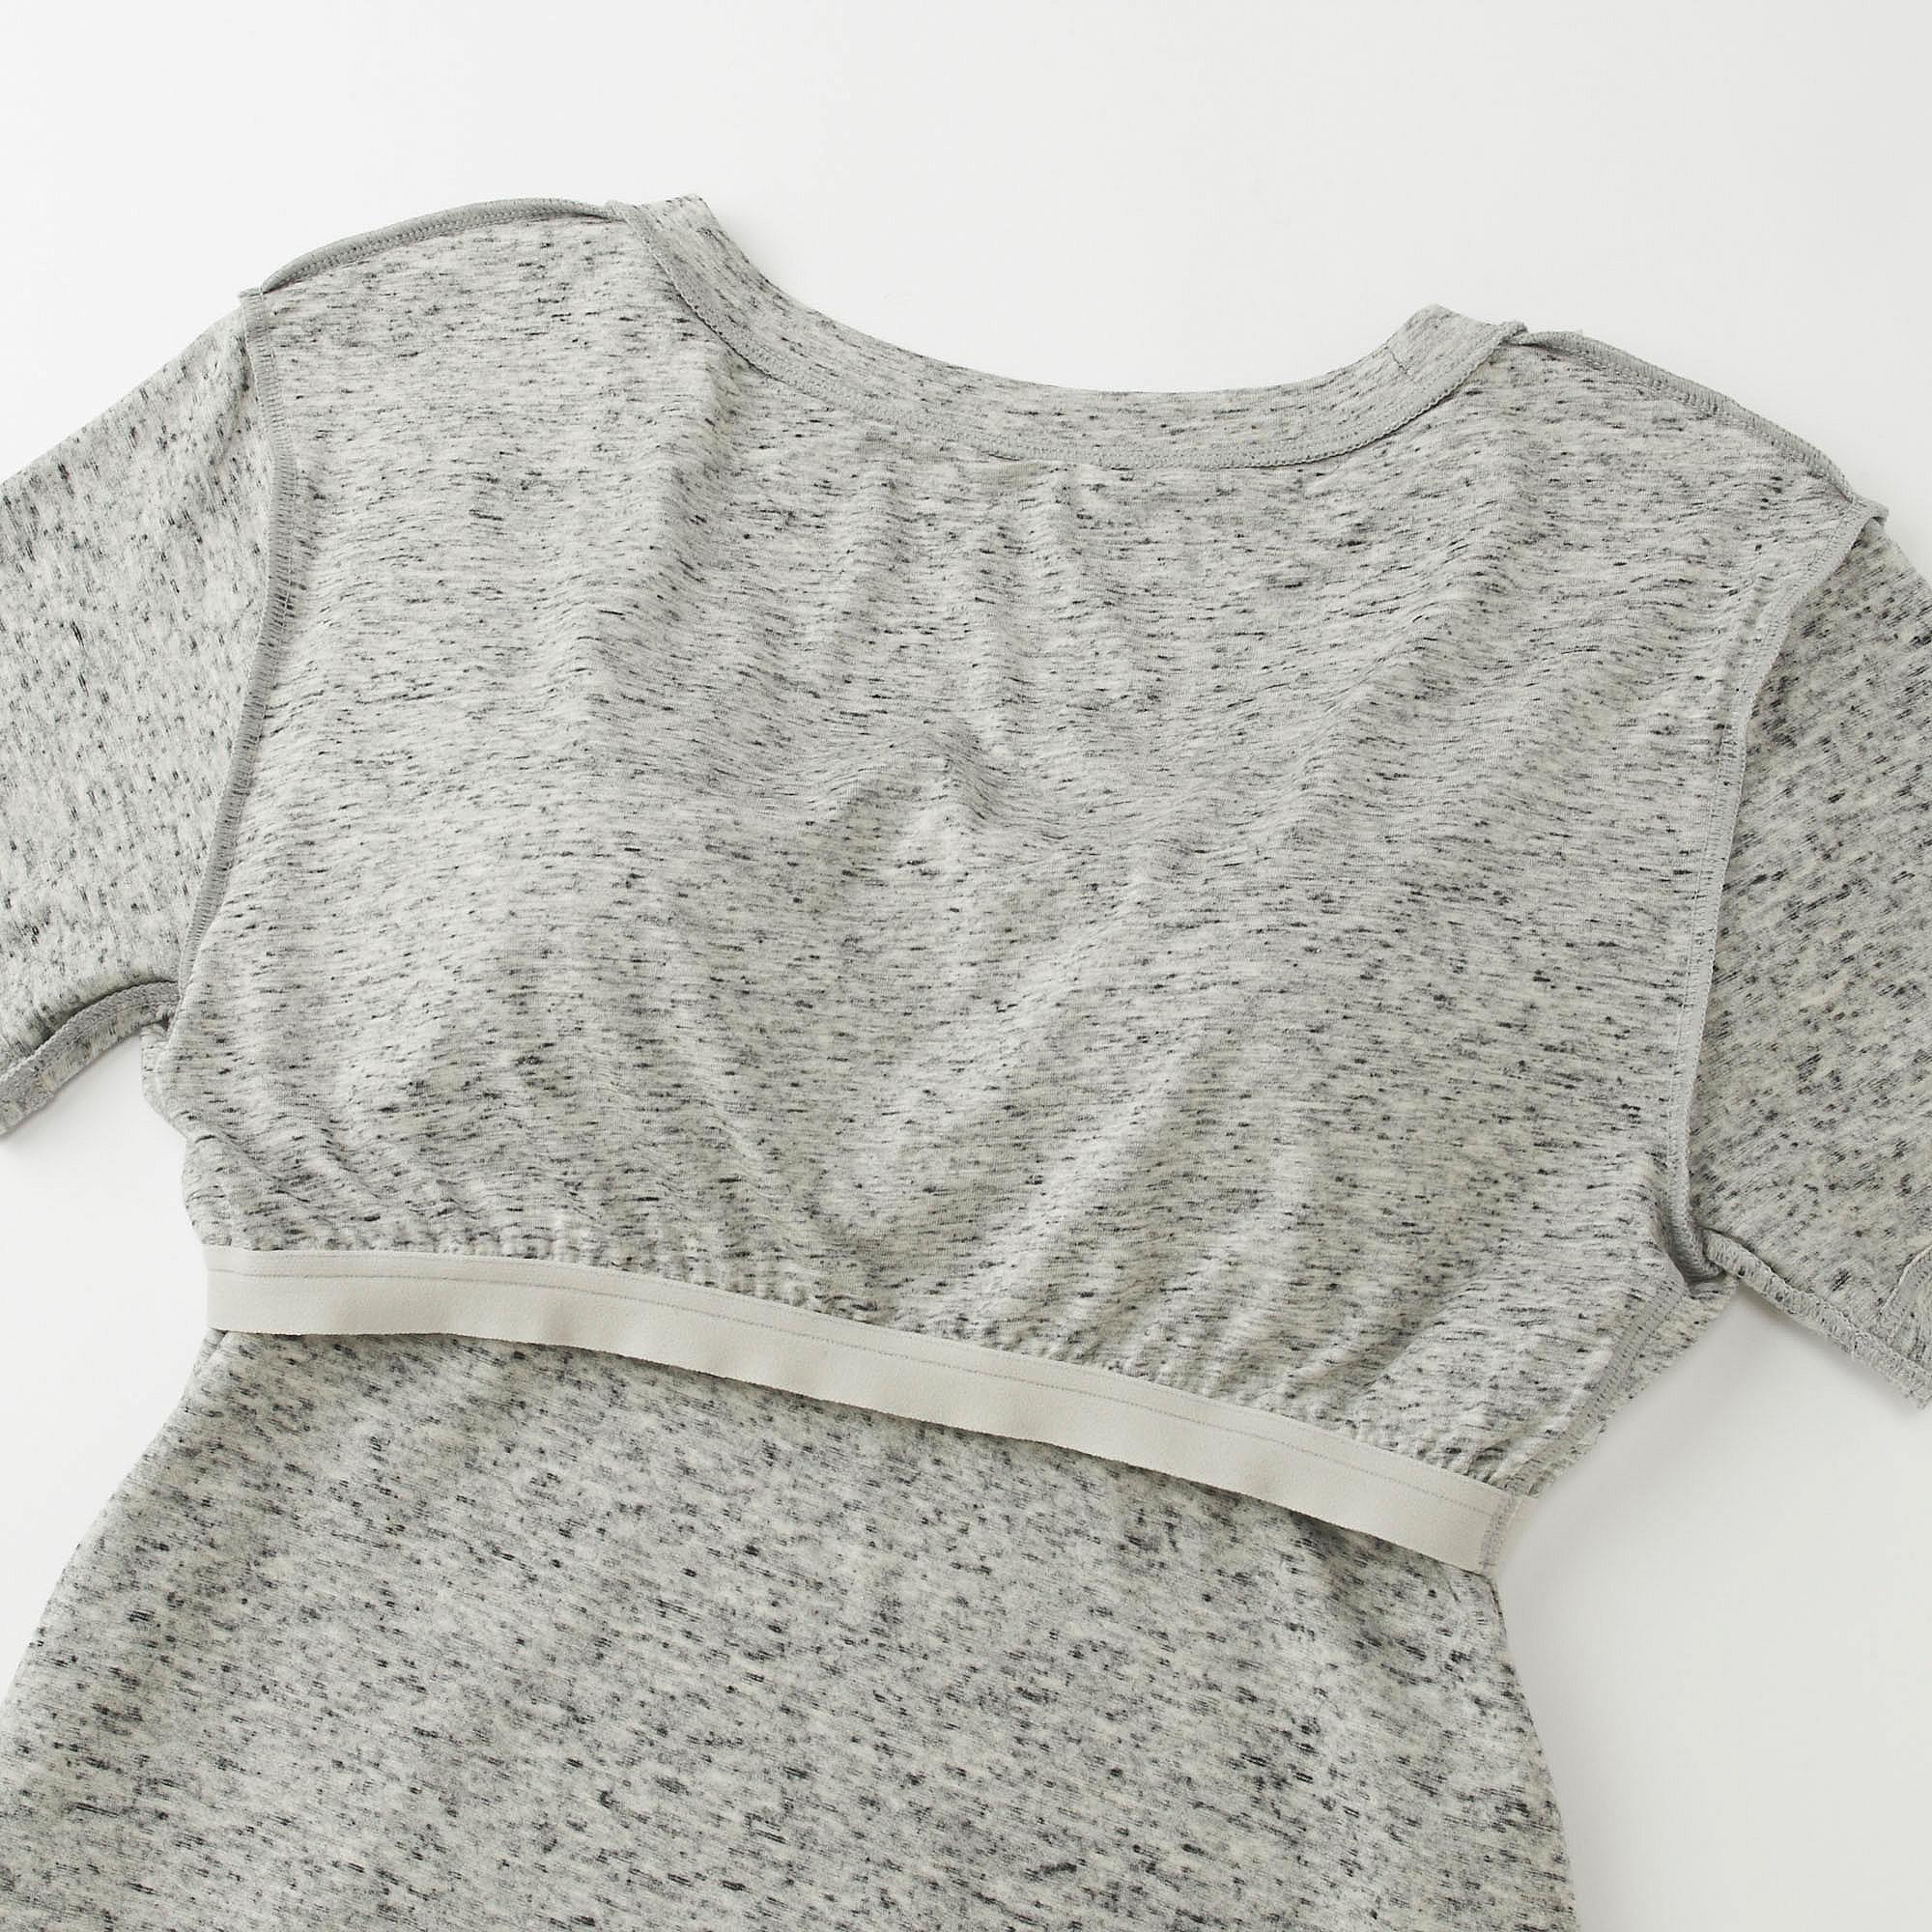 ecc0324213203 Uniqlo WOMEN Short Sleeve Long Bra Dress at £24.9